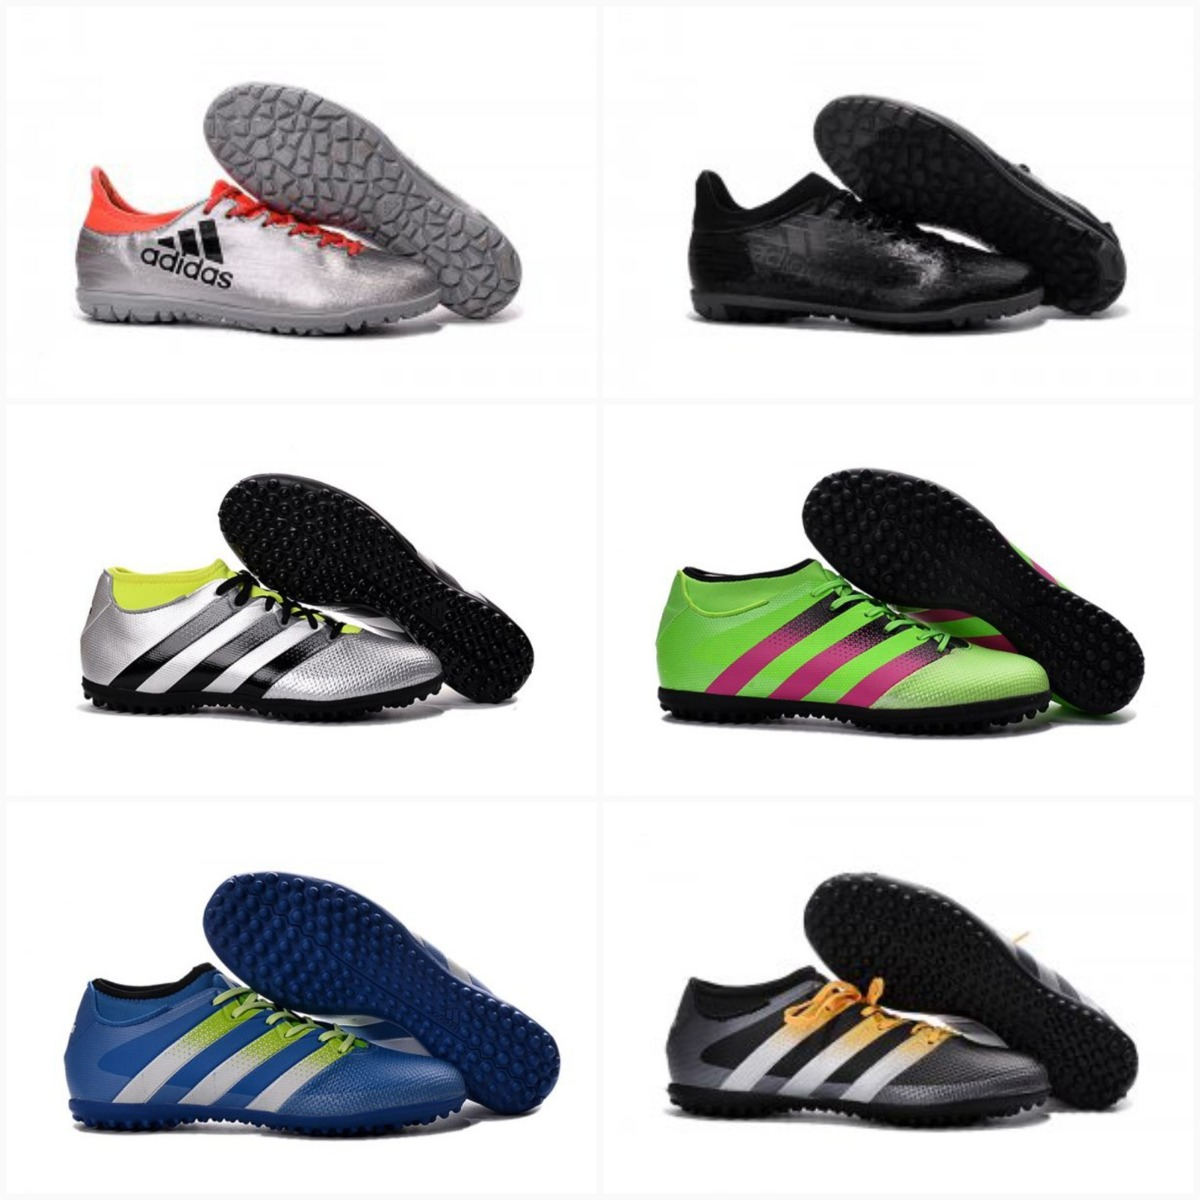 dc79b239fd06a botines futbol 5 nike adidas - talle 44. Cargando zoom.